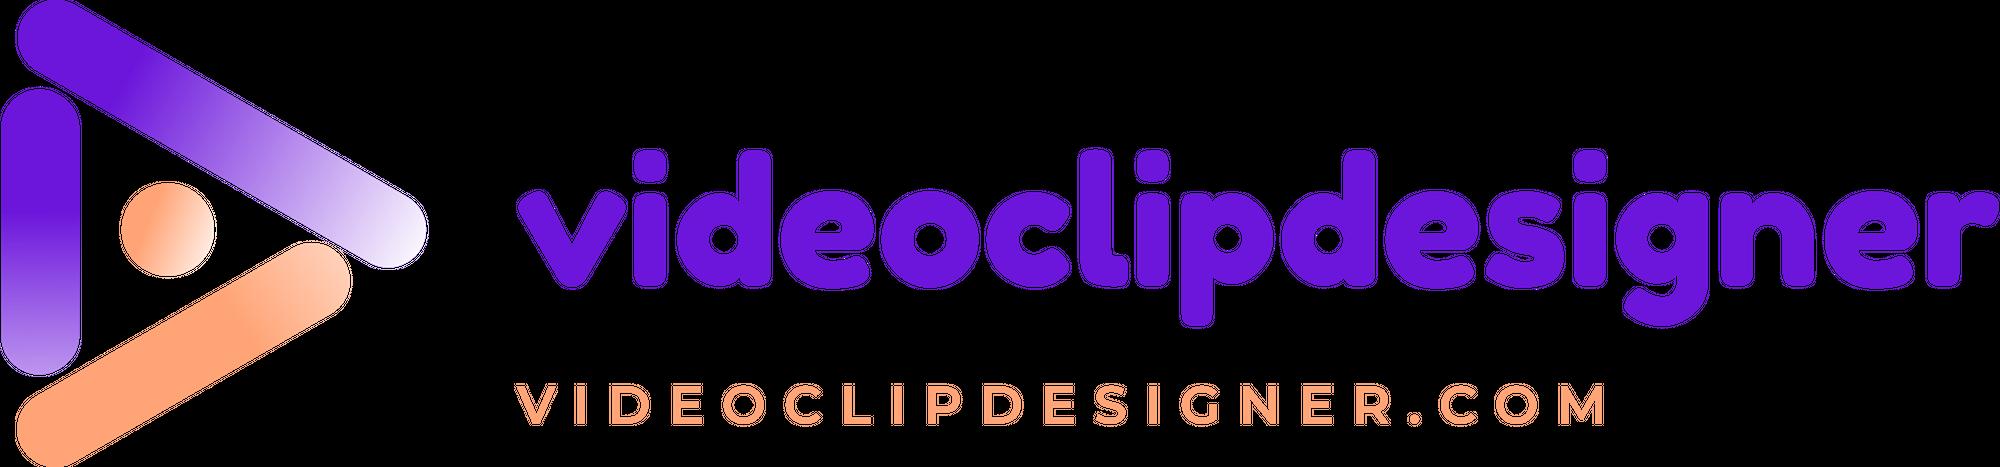 Videoclipdesigner - Affordable Social Media Clips